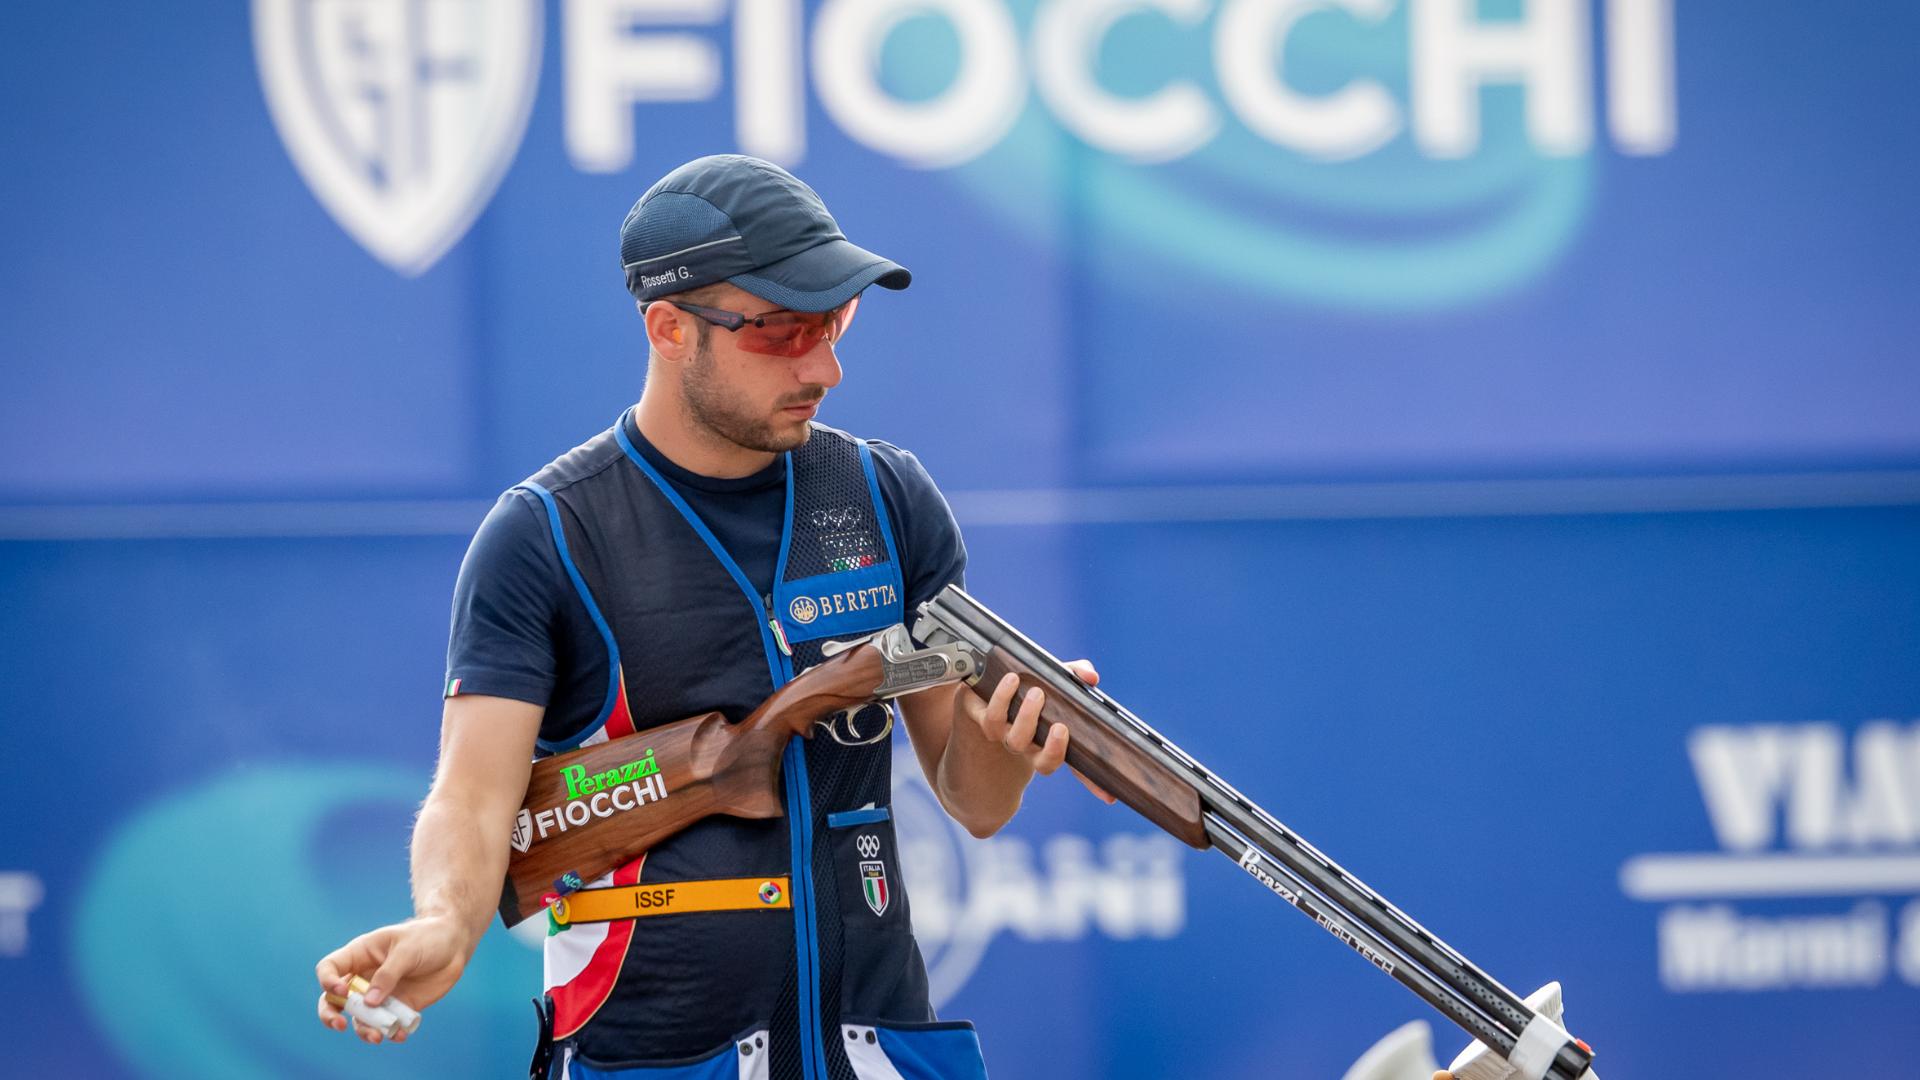 SHOTGUN WORLD CHAMPIONSHIP: A FIOCCHI'S TRIUMPH